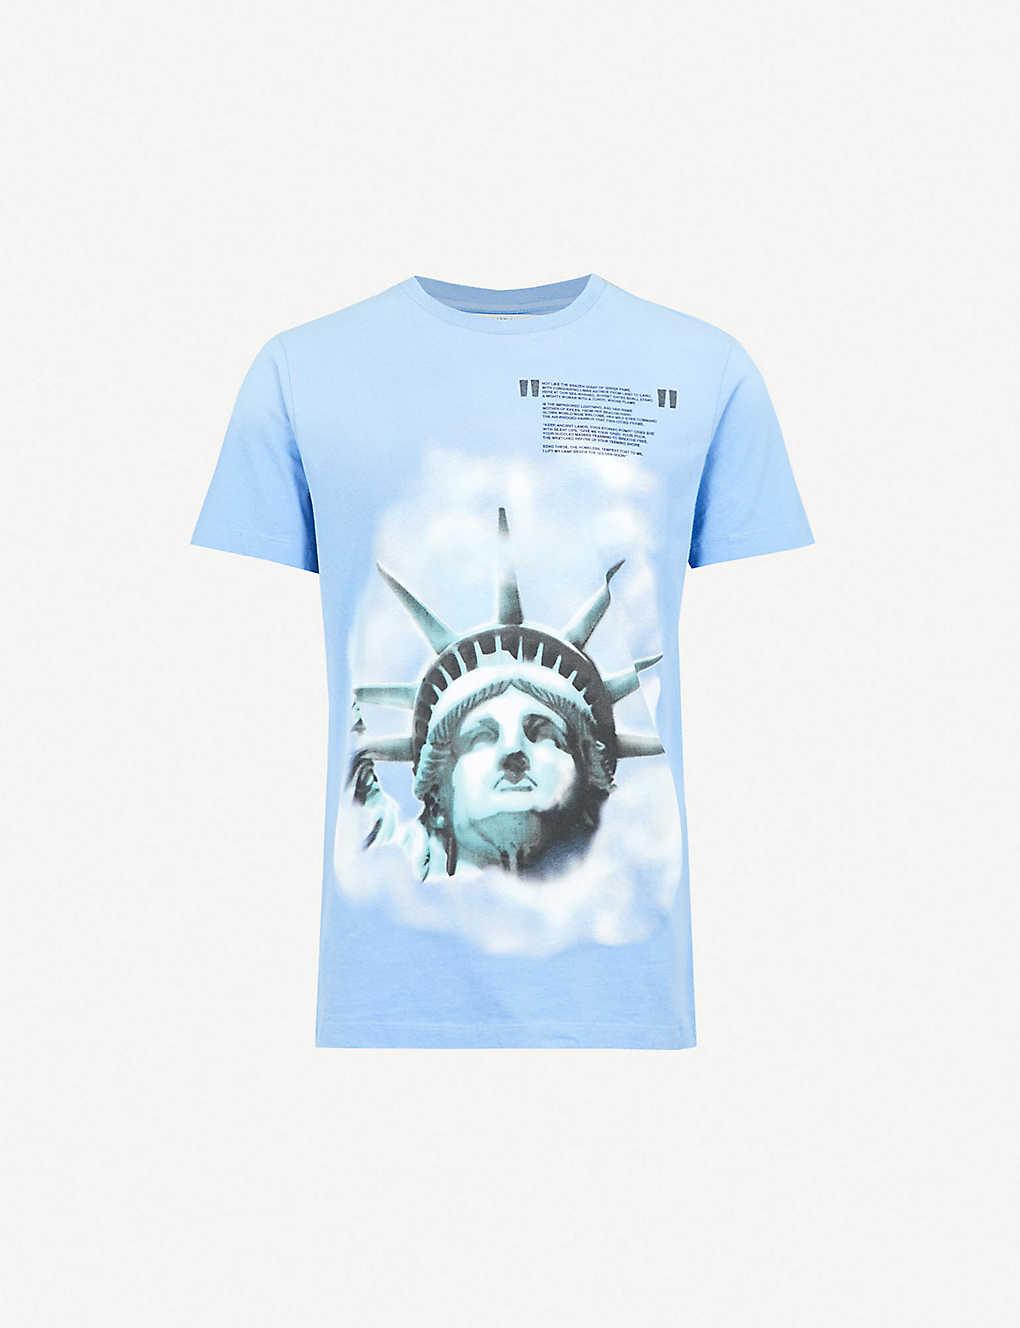 41ae13964 OFF-WHITE C/O VIRGIL ABLOH - Liberty cotton-jersey T-shirt | Selfridges.com